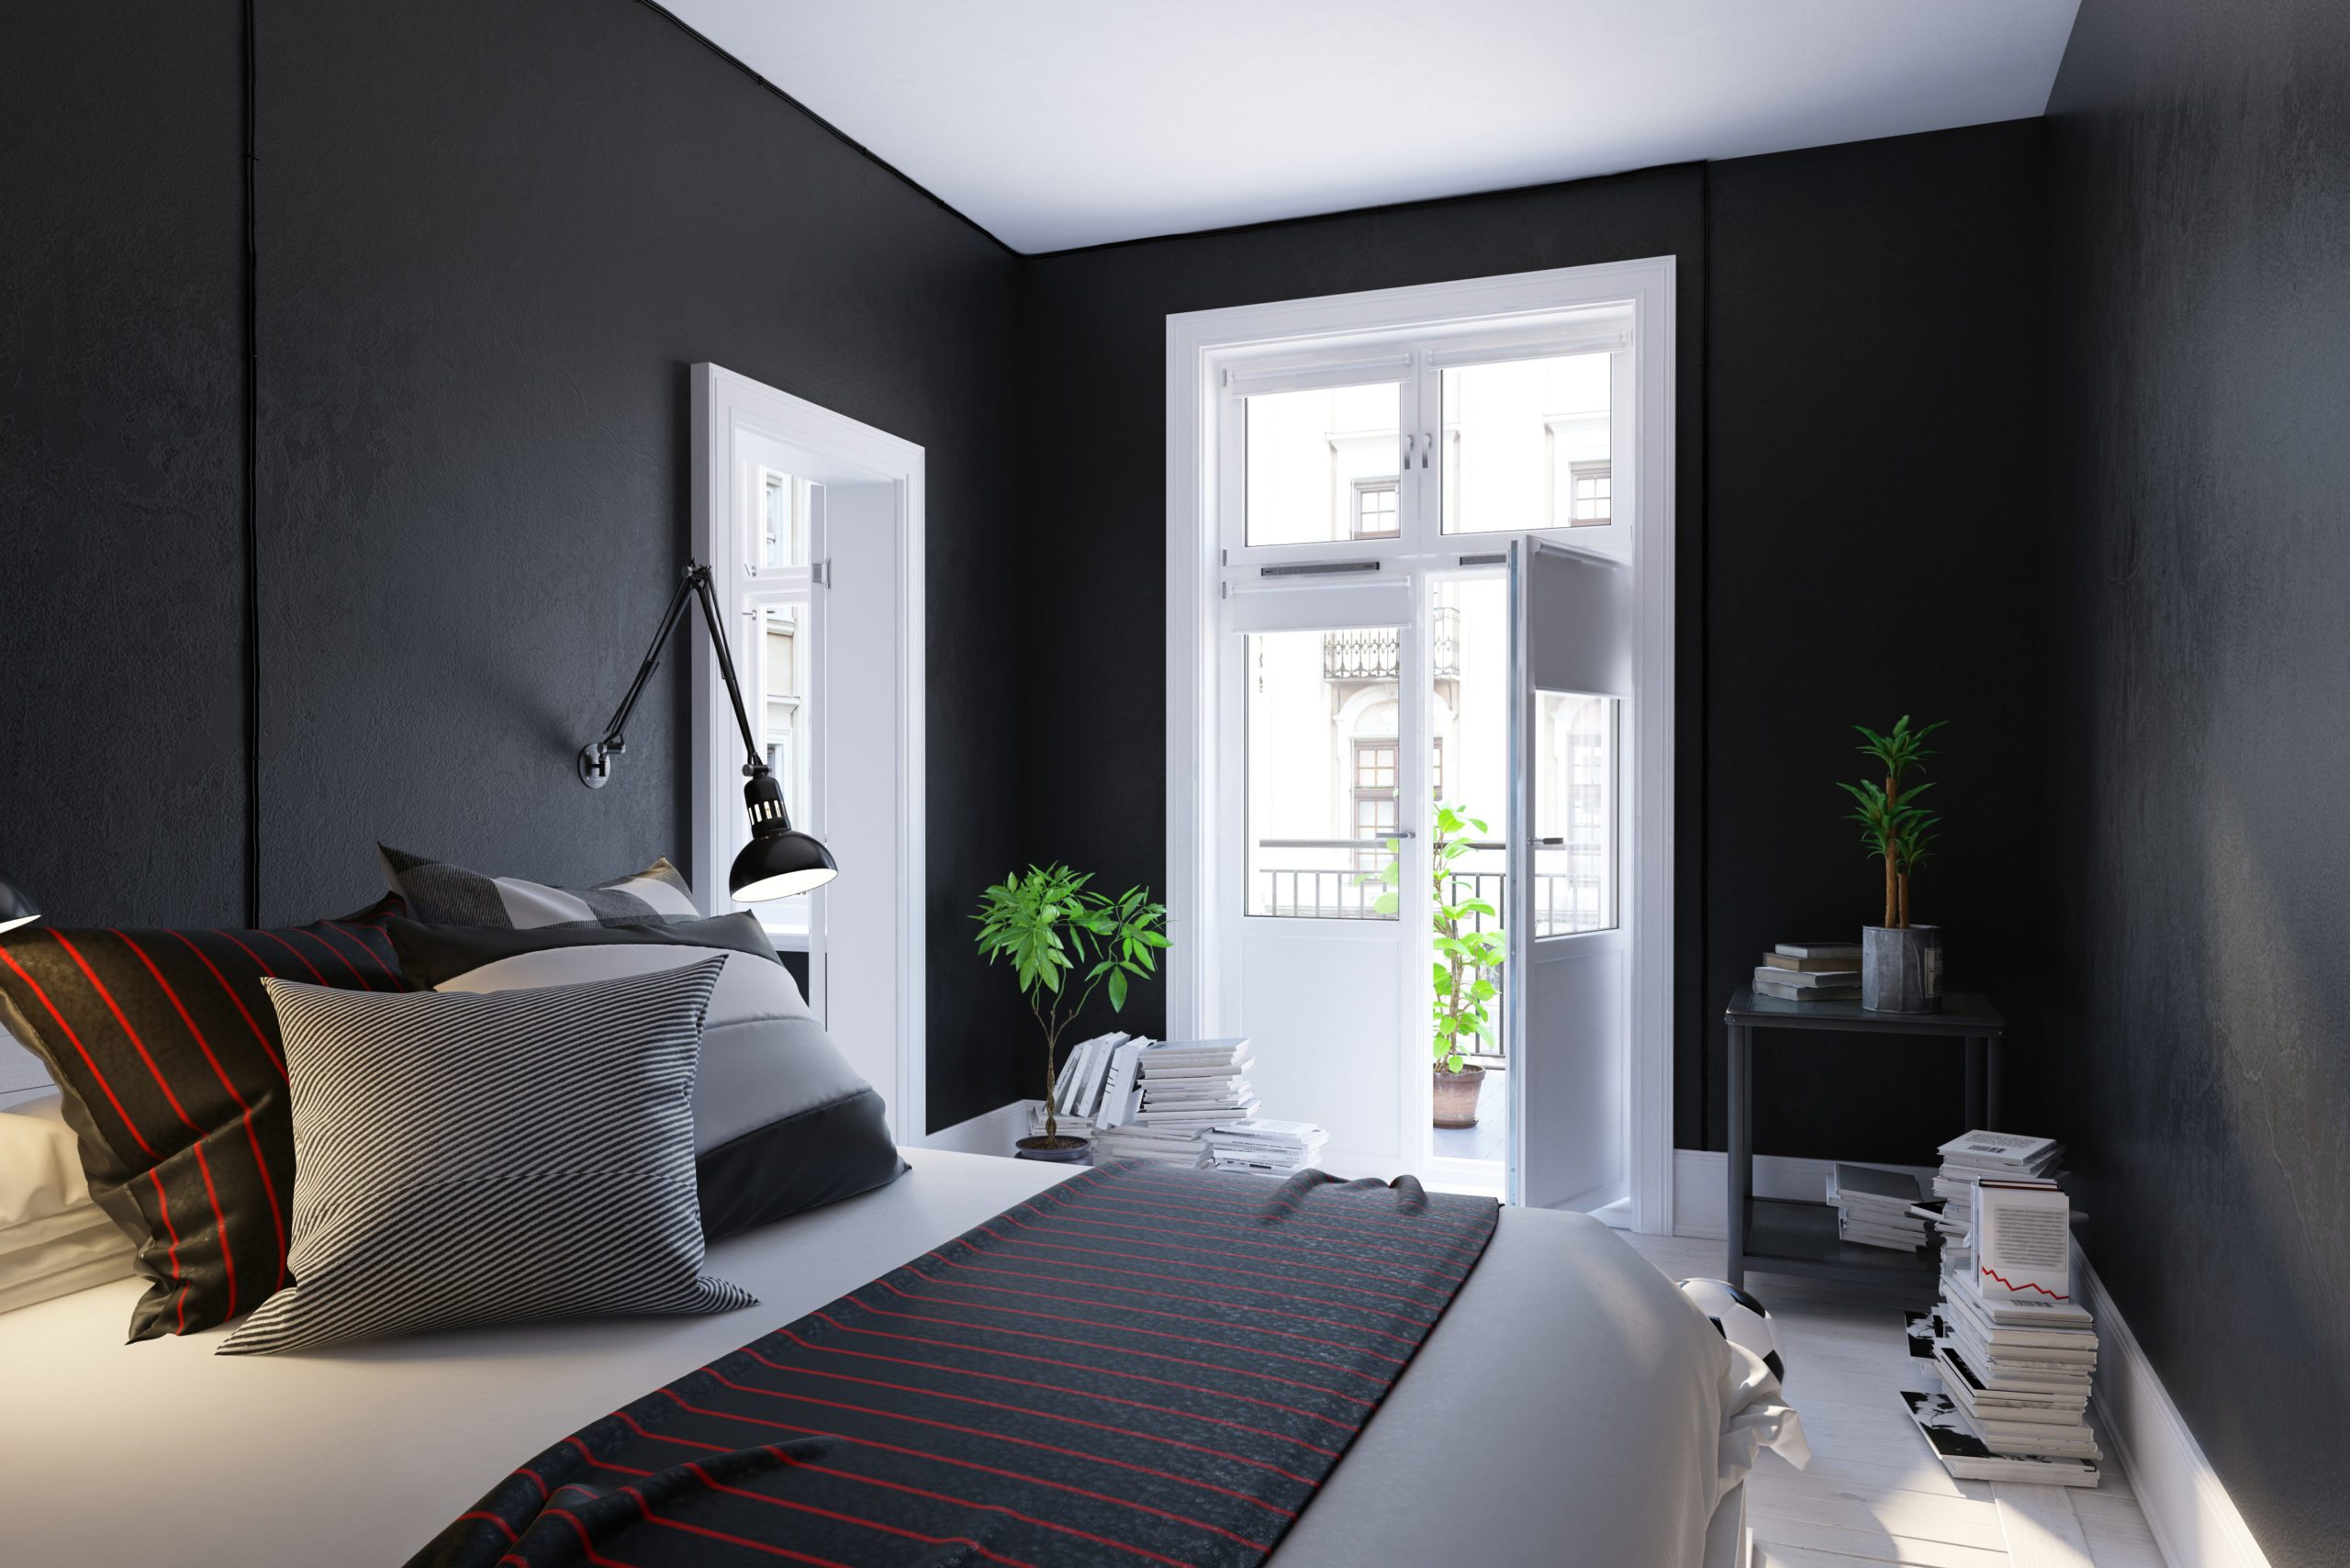 Black living room interior, Scandinavian style